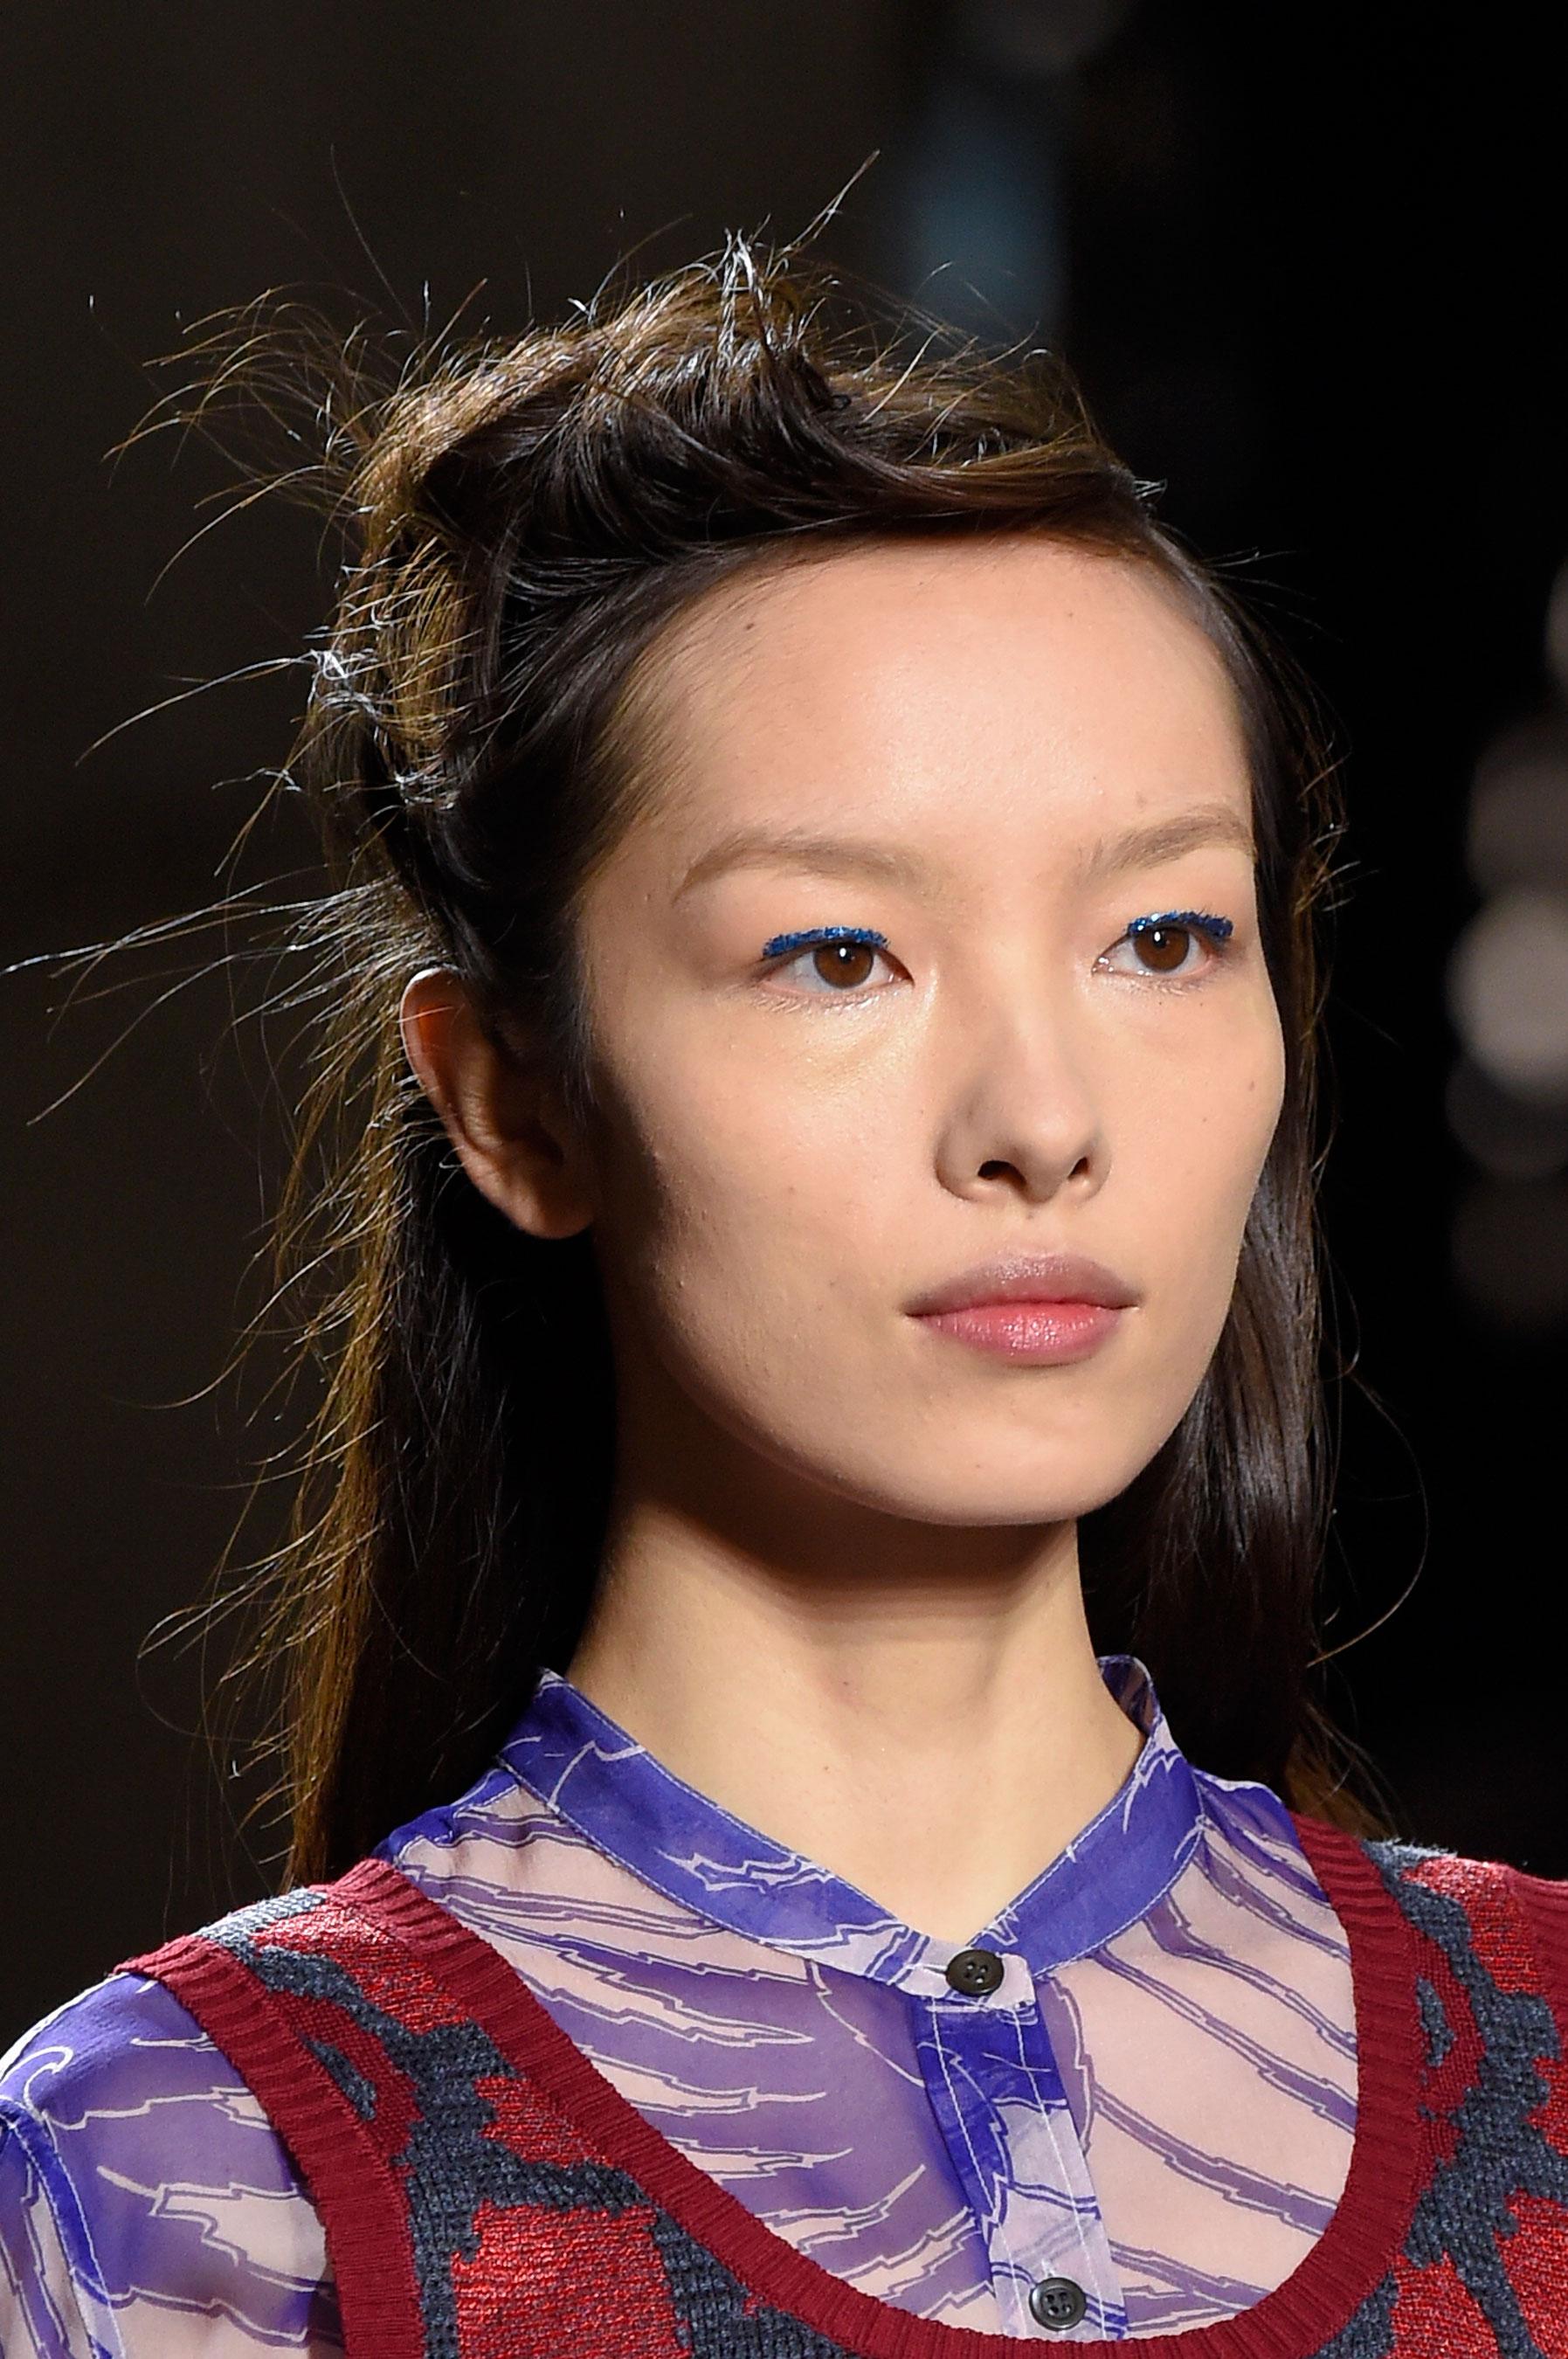 Dries-van-Noten-spring-2016-runway-beauty-fashion-show-the-impression-24